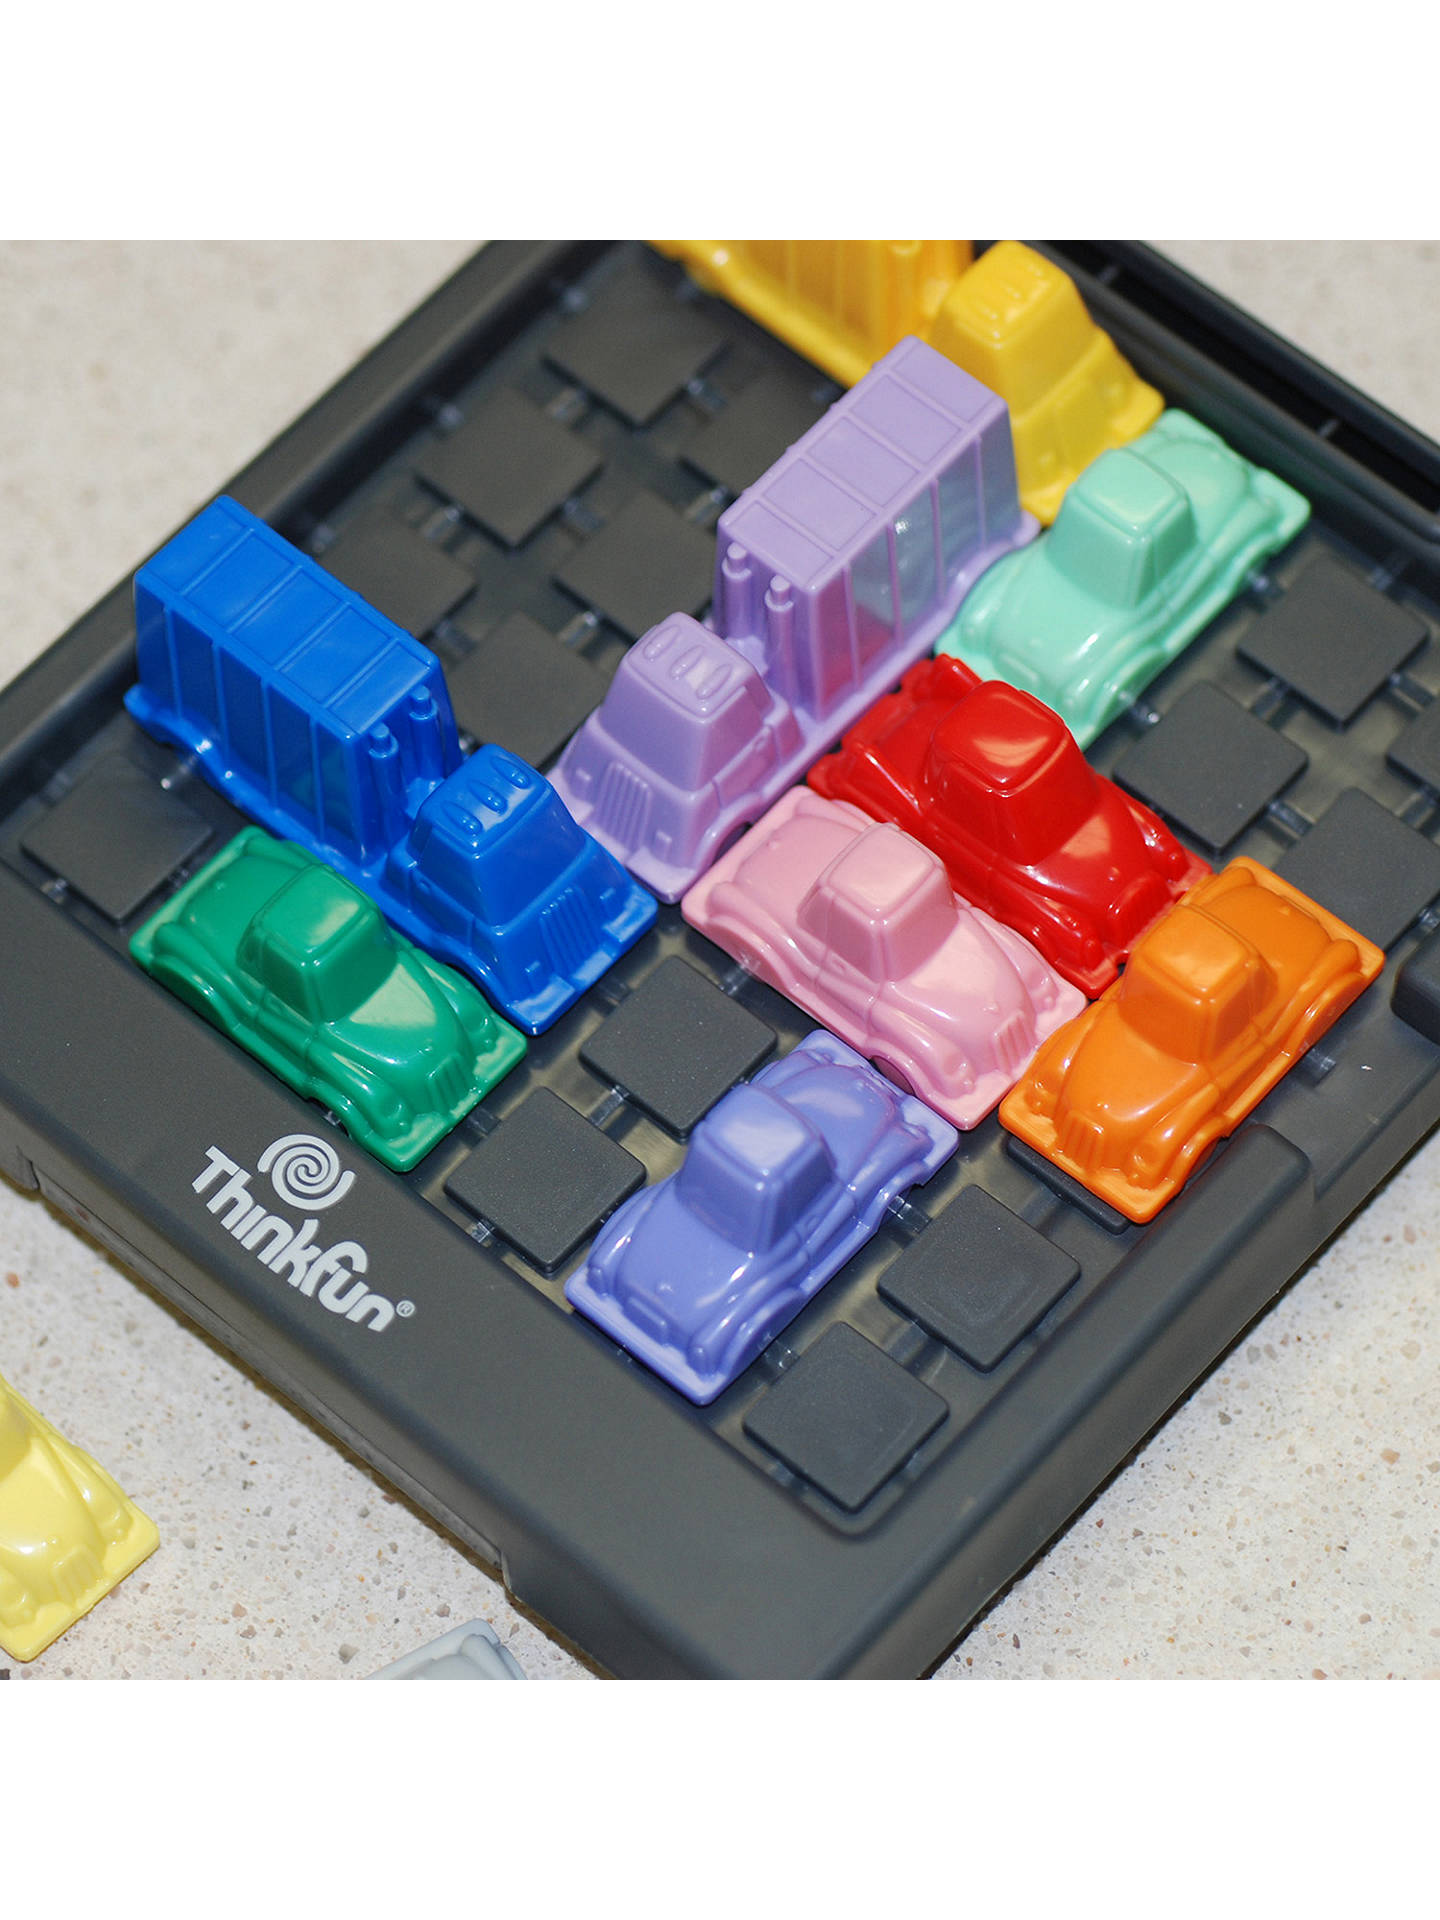 Replacement Parts Pieces You Choose! Rush Hour Traffic Jam Logic Game Thinkfun